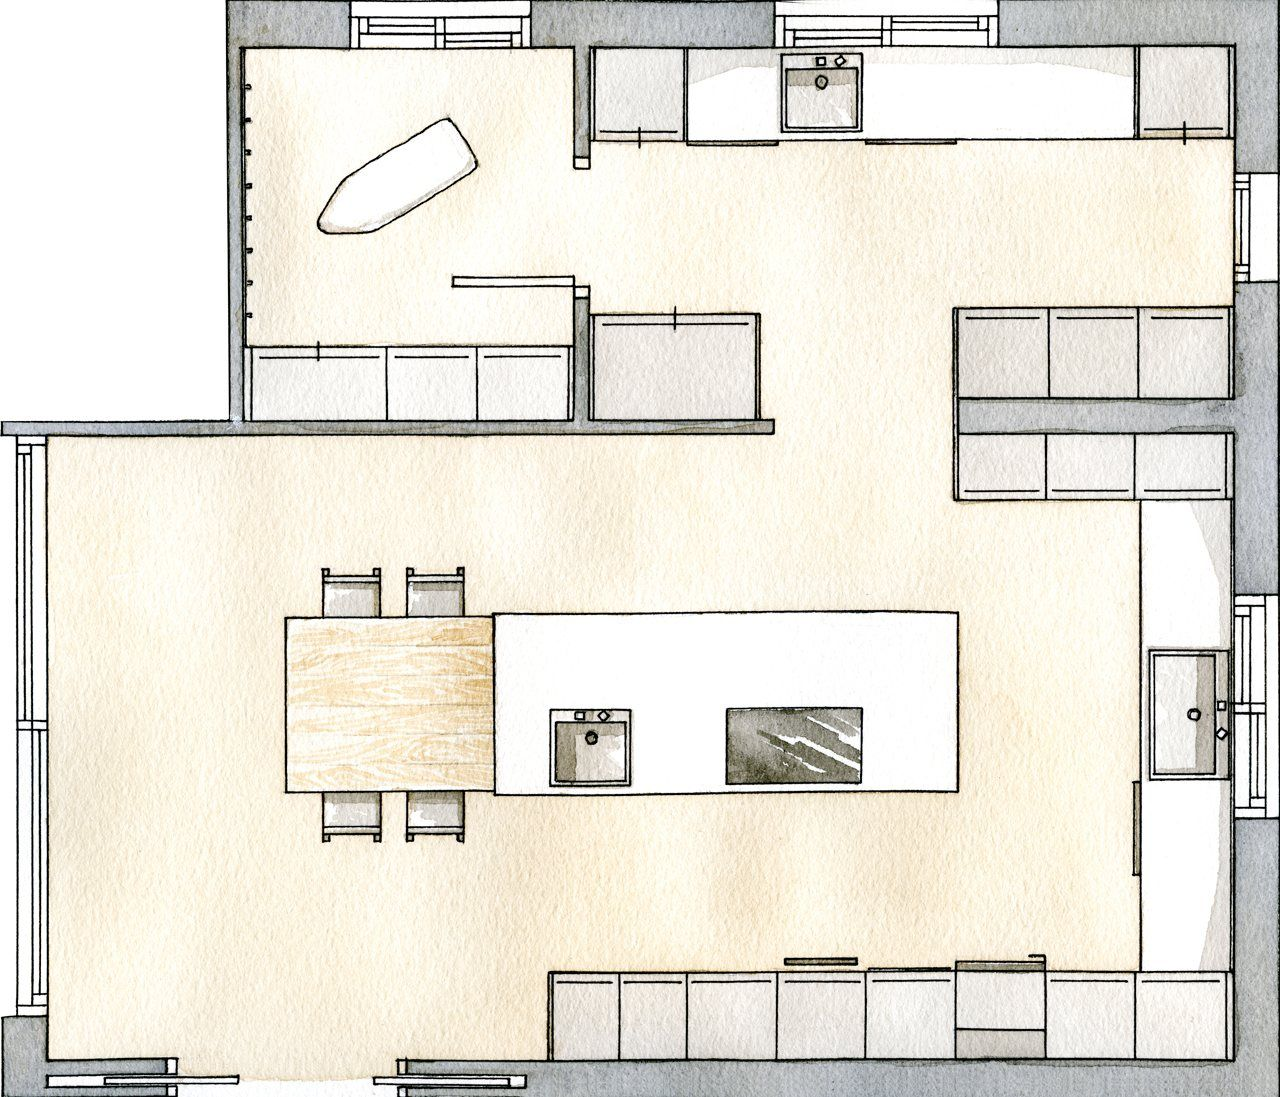 Un Office Acogedor Planos De Cocinas Planos De Casas Cocinas